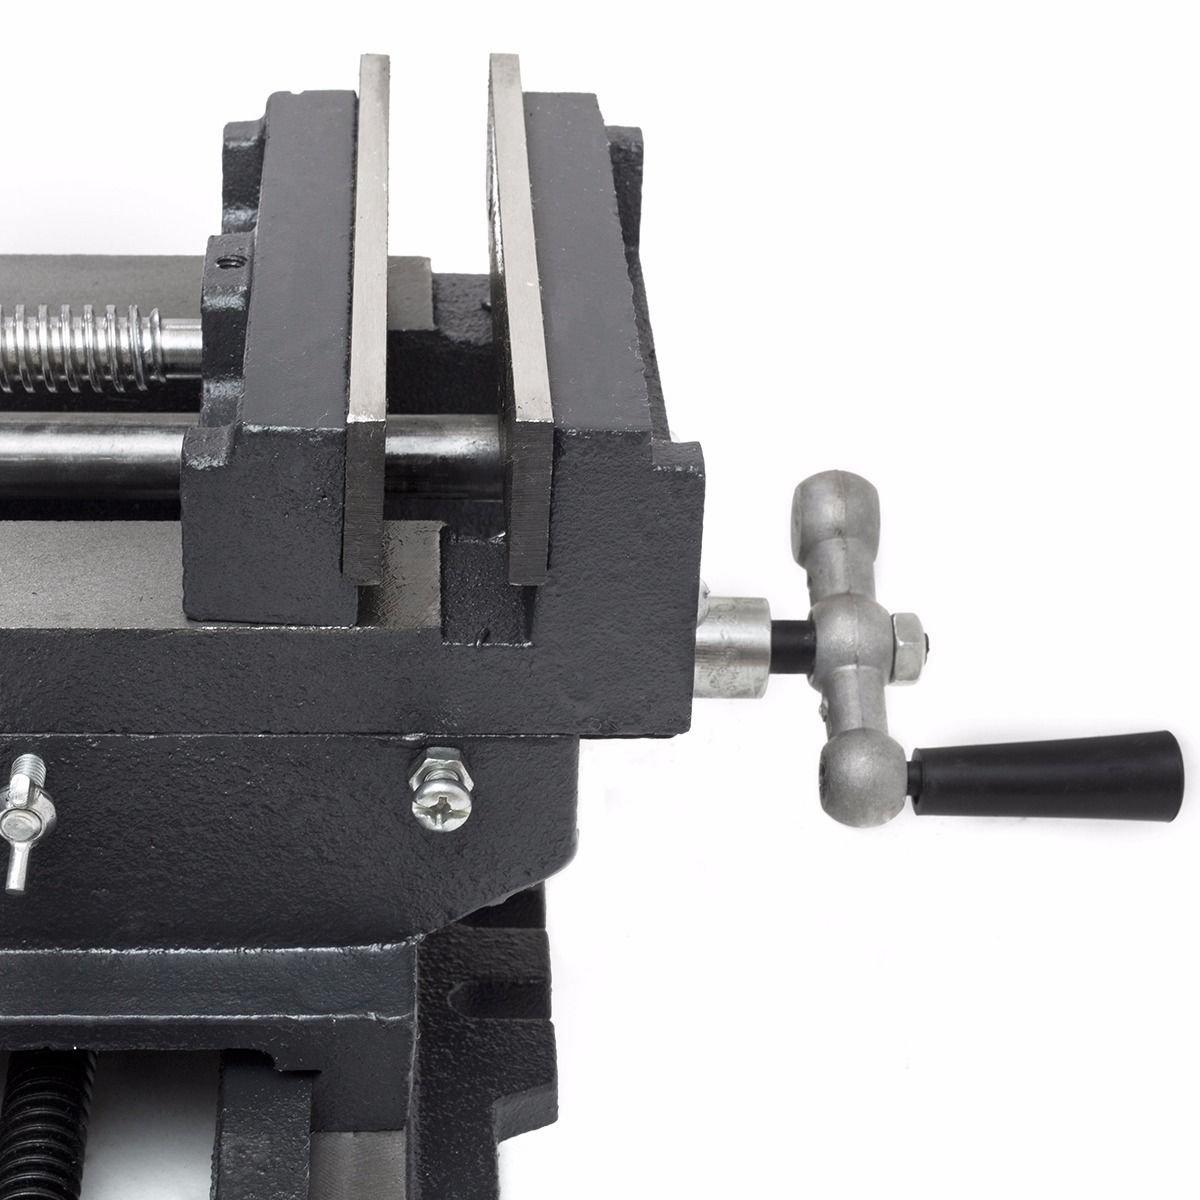 GHP drill press